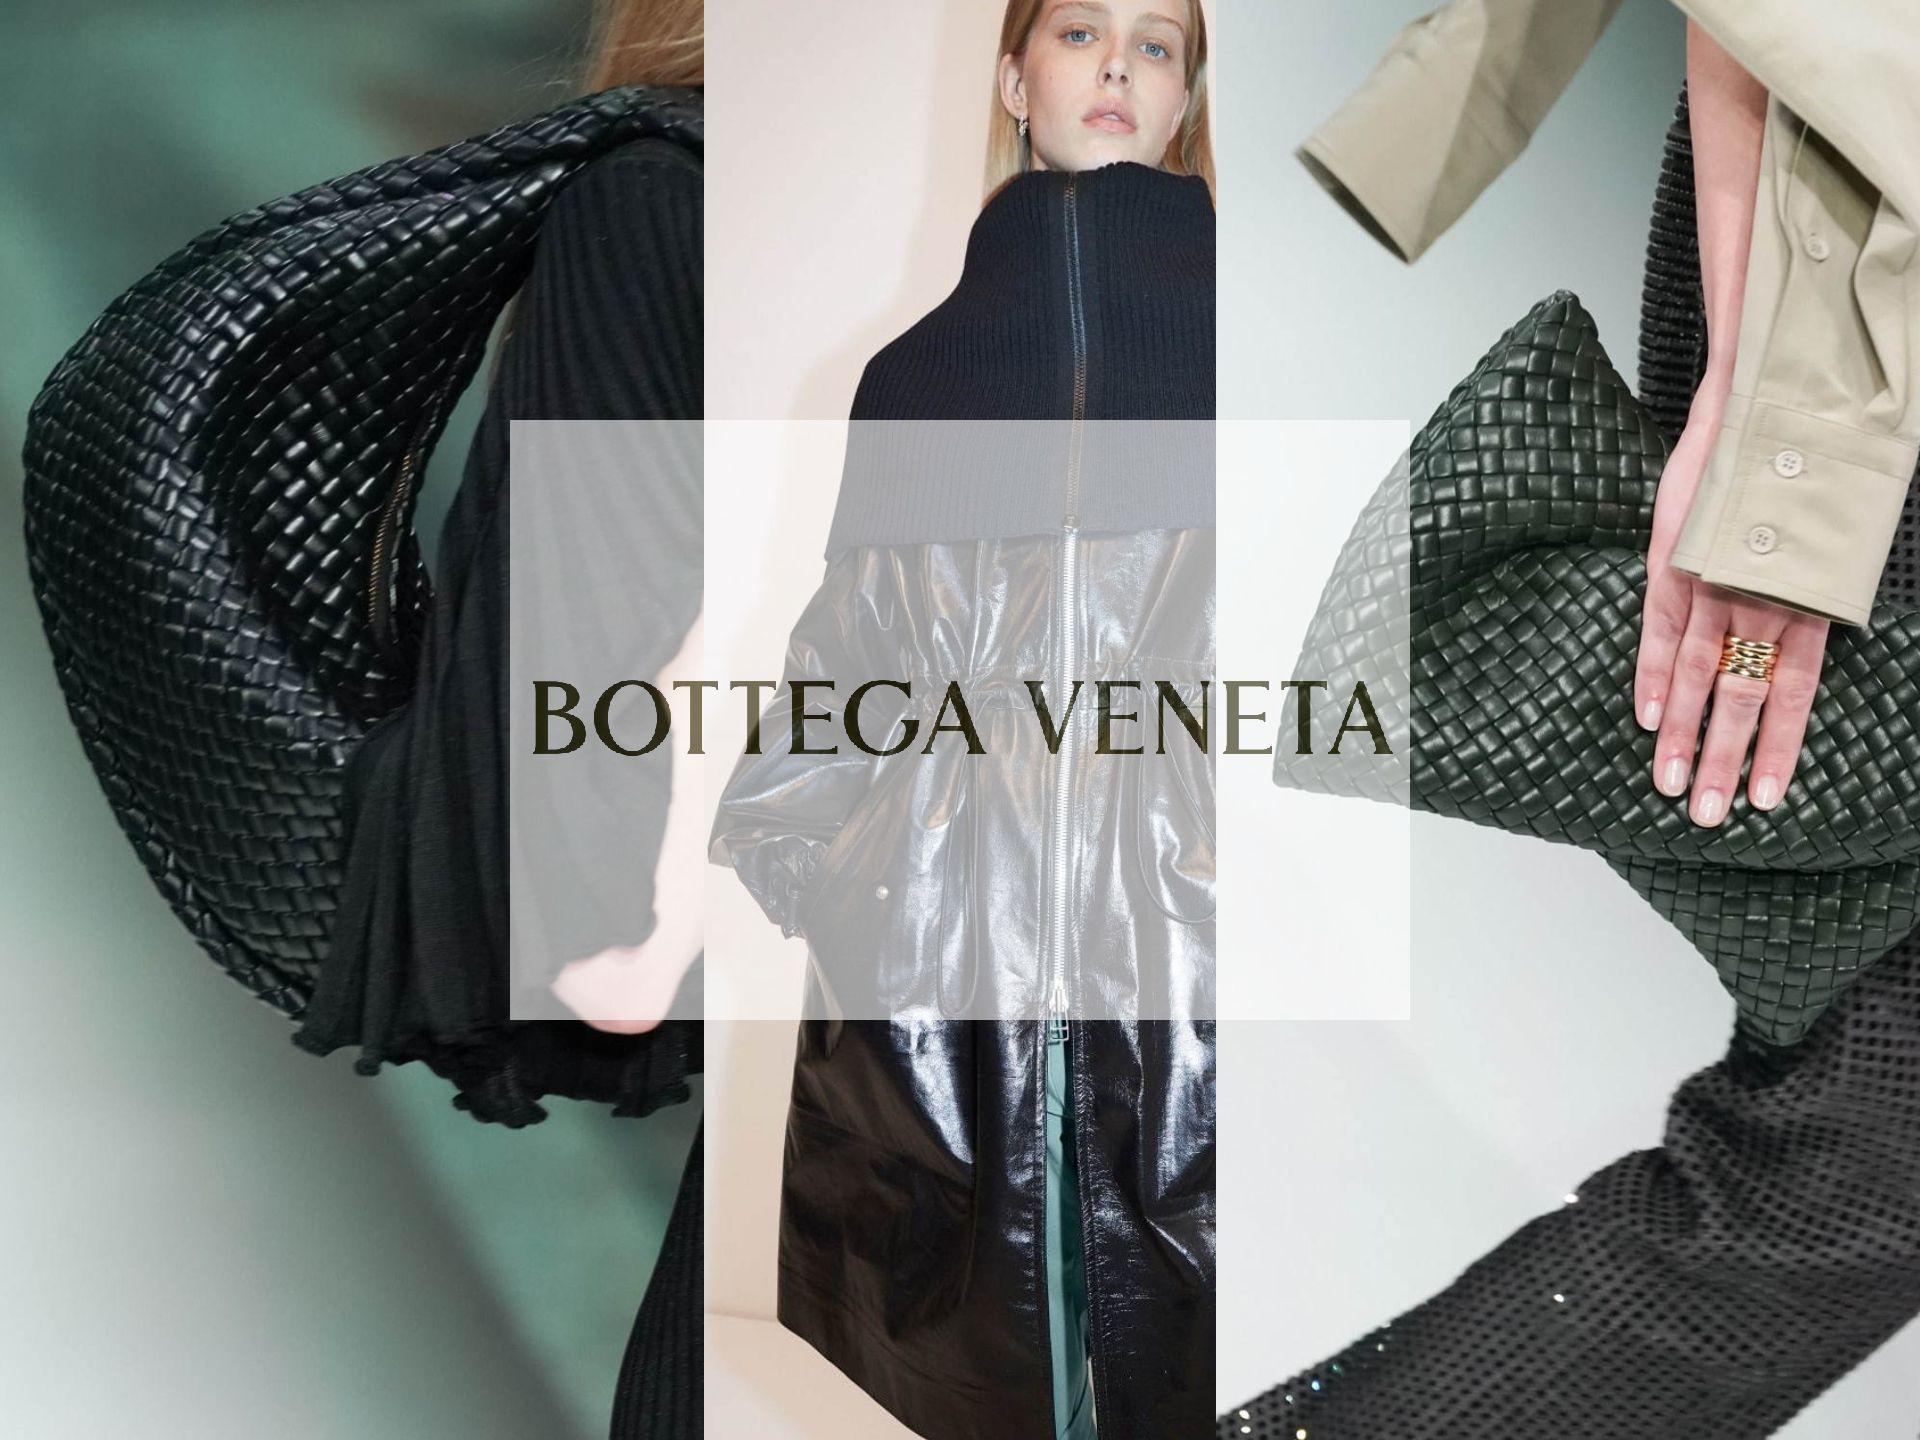 Bottega Veneta(ボッテガヴェネタ)